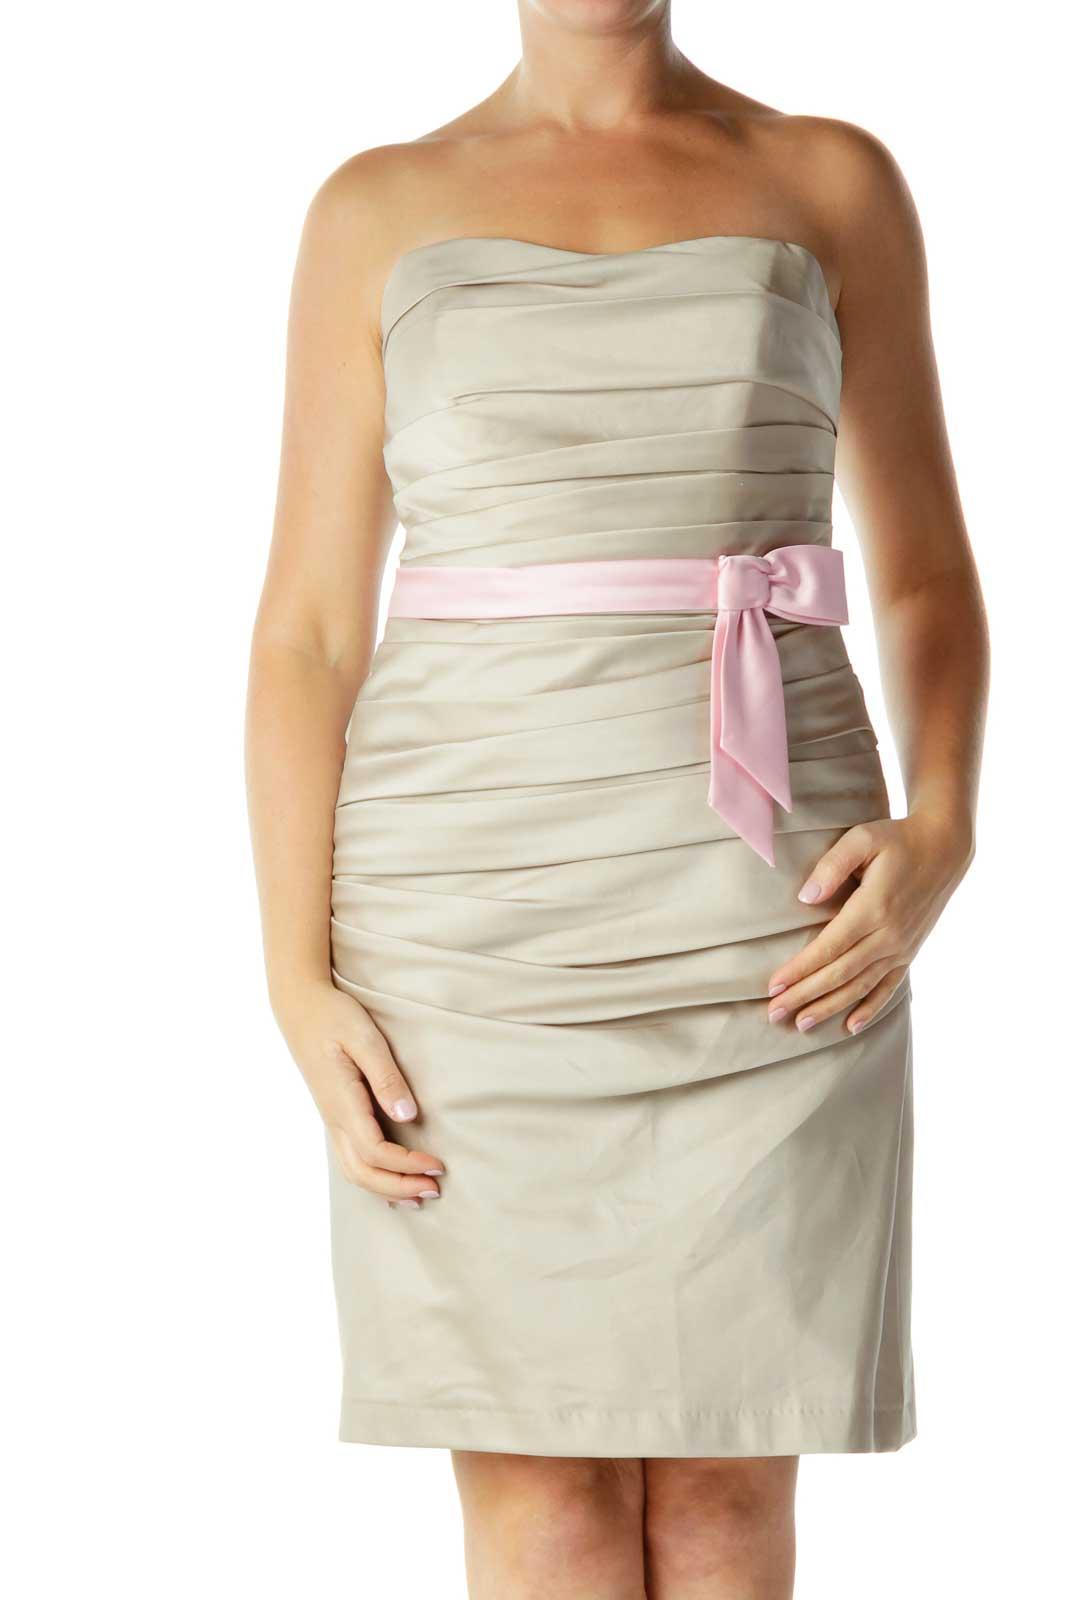 Beige Strapless Cocktail Dress Front